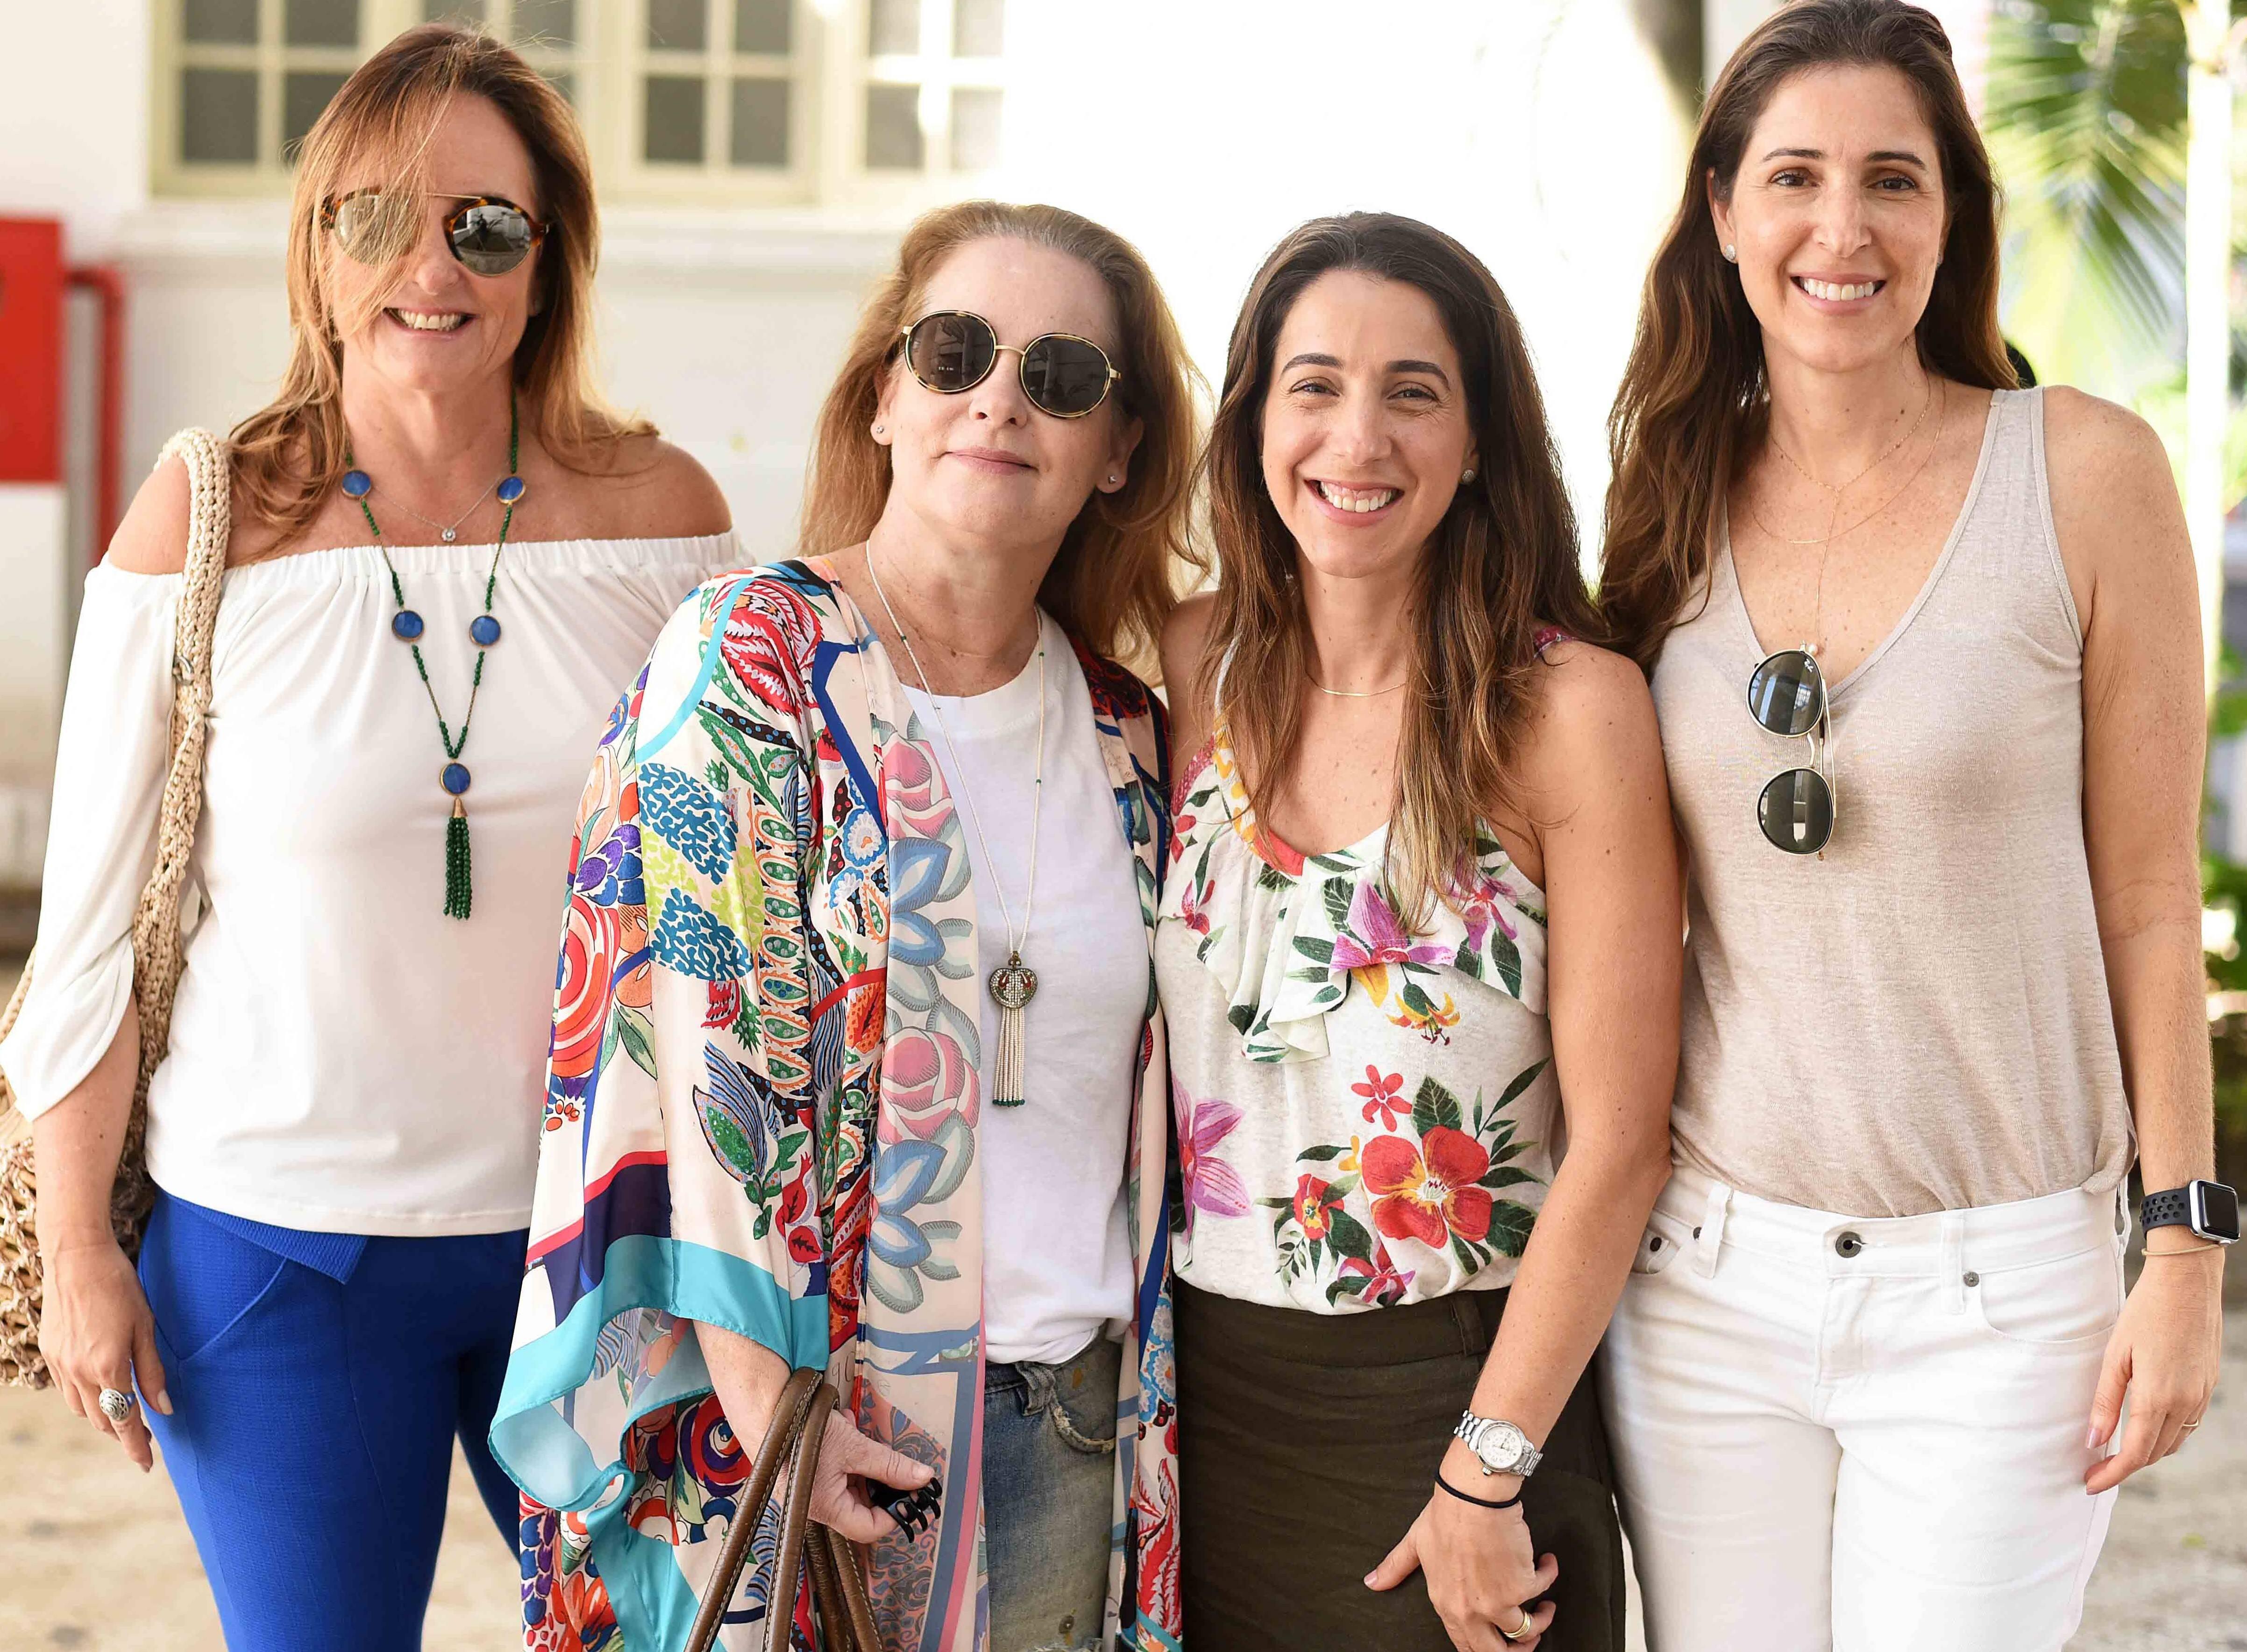 Tiana Meggiolaro, Bia Mayrinck, Rafaella de Brito e Isabella de Brito /Foto: Ari Kaye